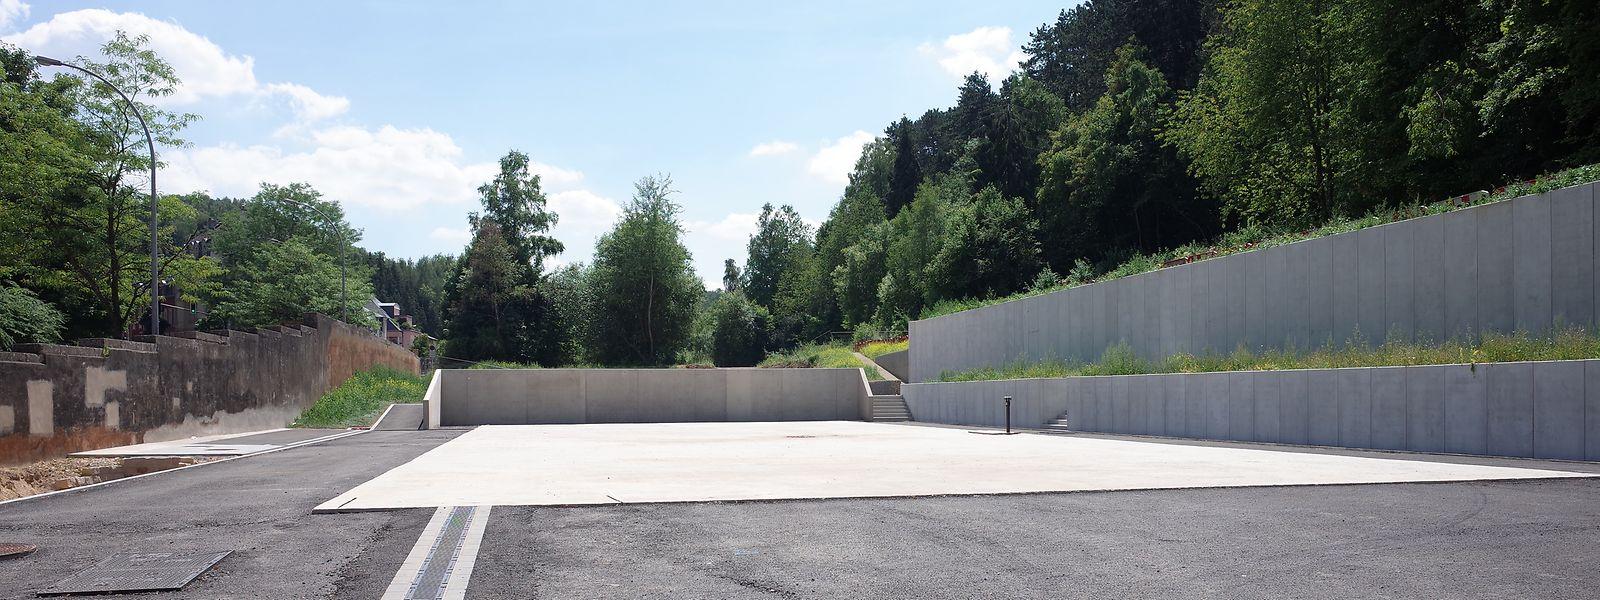 Die Plattform für das Flüchtlingsheim steht bereits am Quai Neudorf.